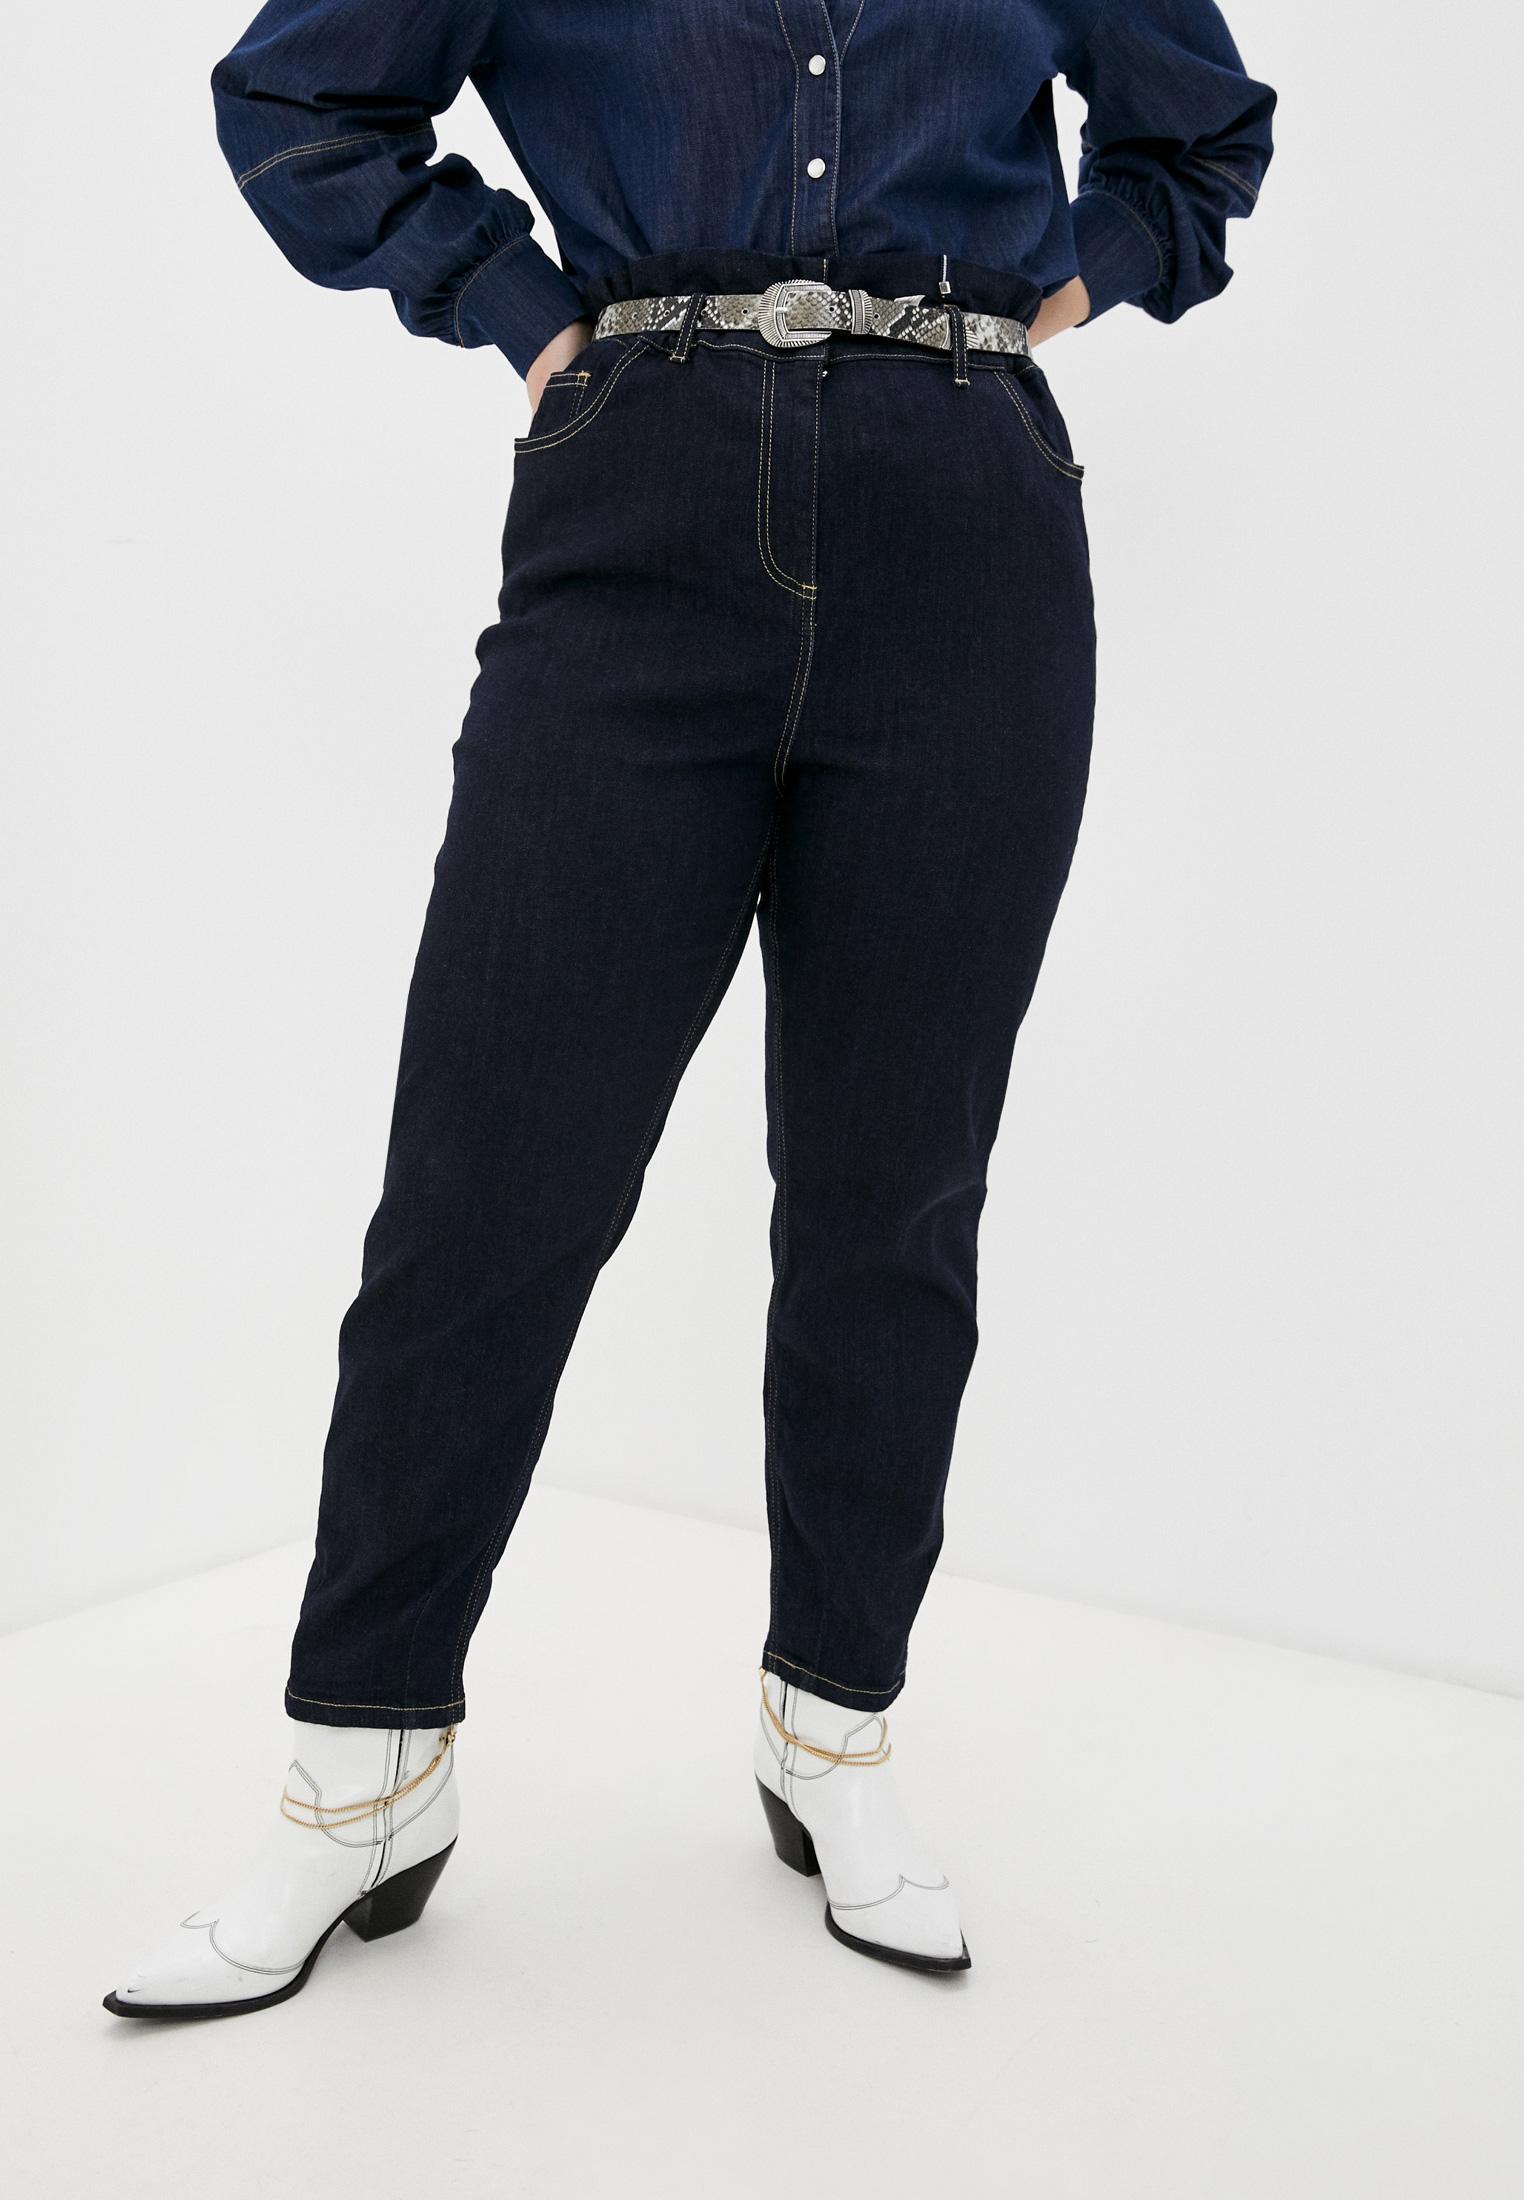 Зауженные джинсы Persona by Marina Rinaldi 1181131